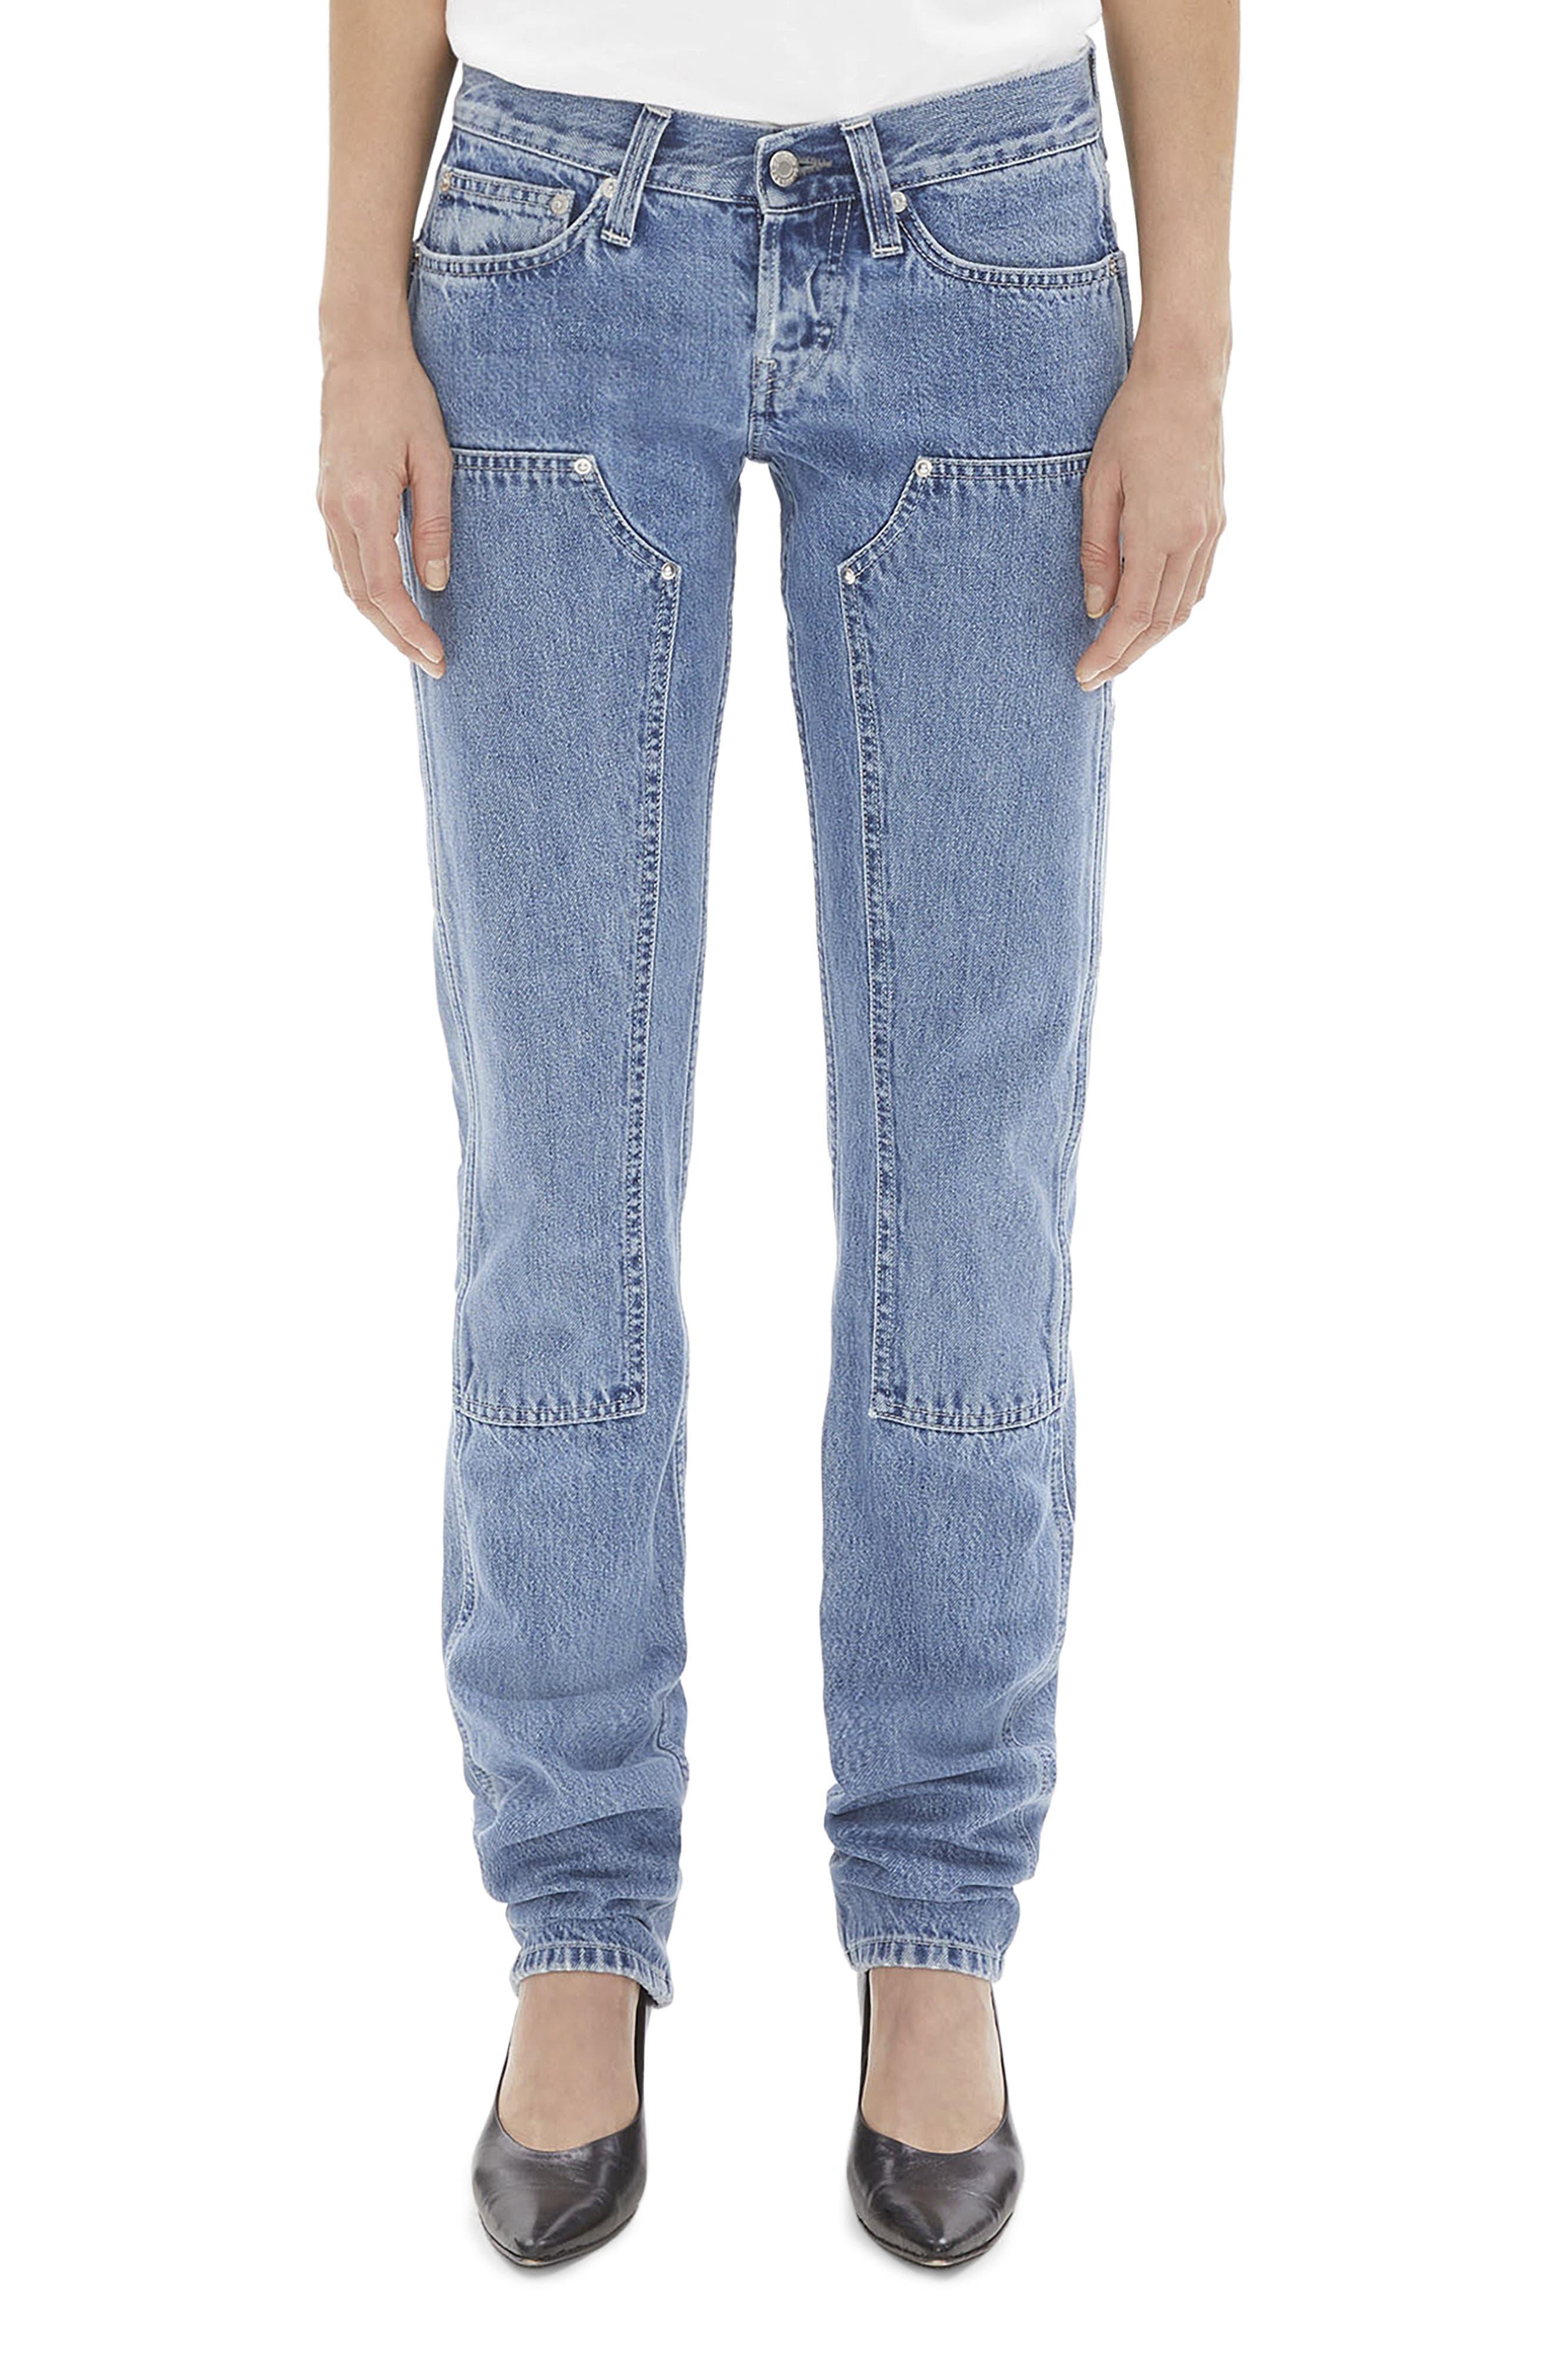 Helmut Lang Jeans Masc Utility Jeans